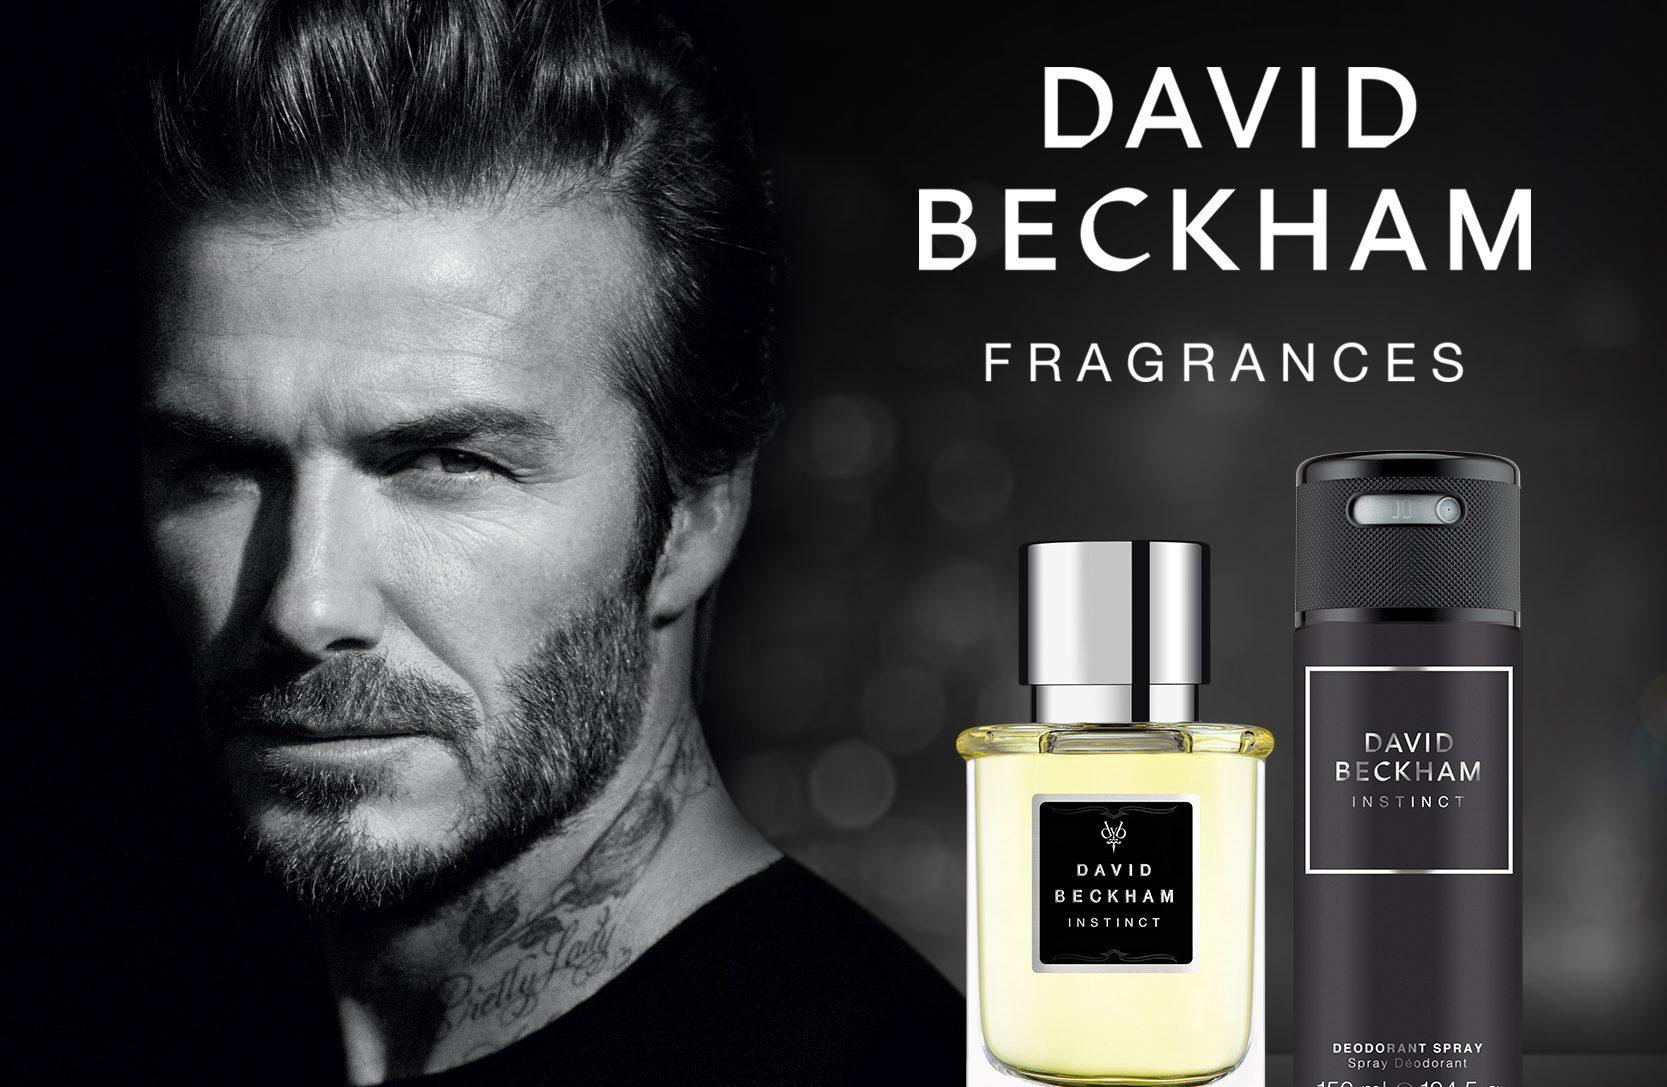 David-Beckham-Key-Visuals-Instinct.jpg